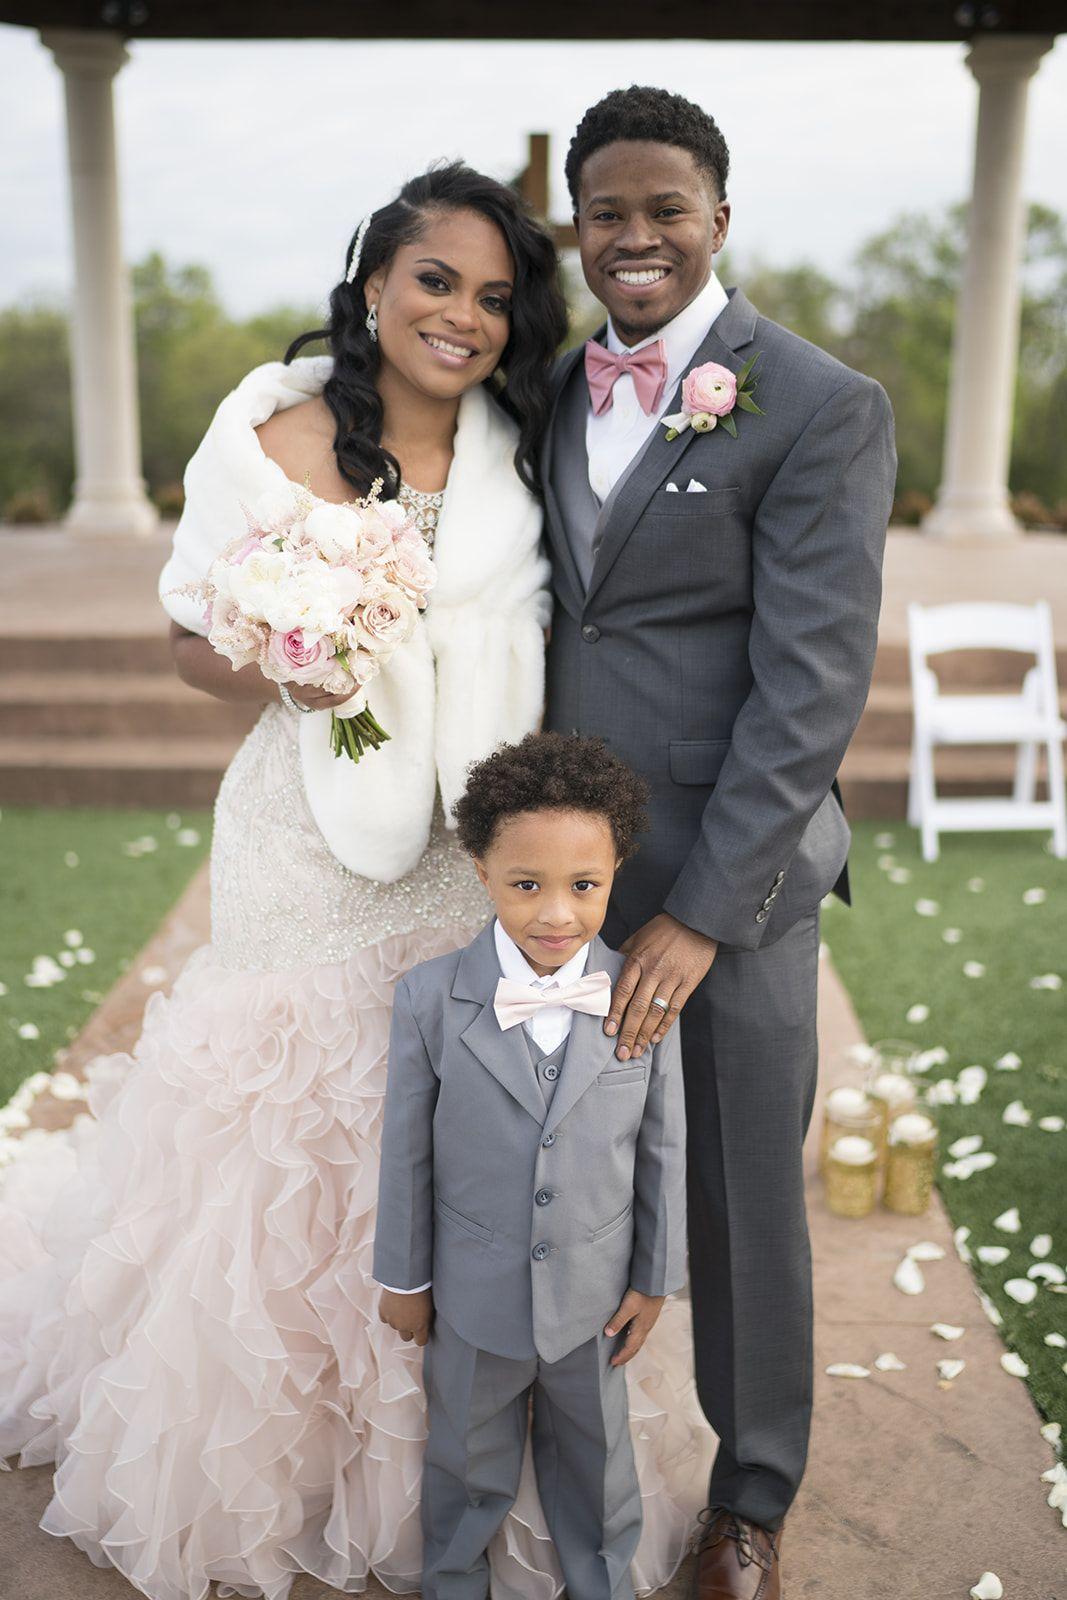 Luxury Wedding Ring Bearer Ring Bearer In A Light Grey Suit